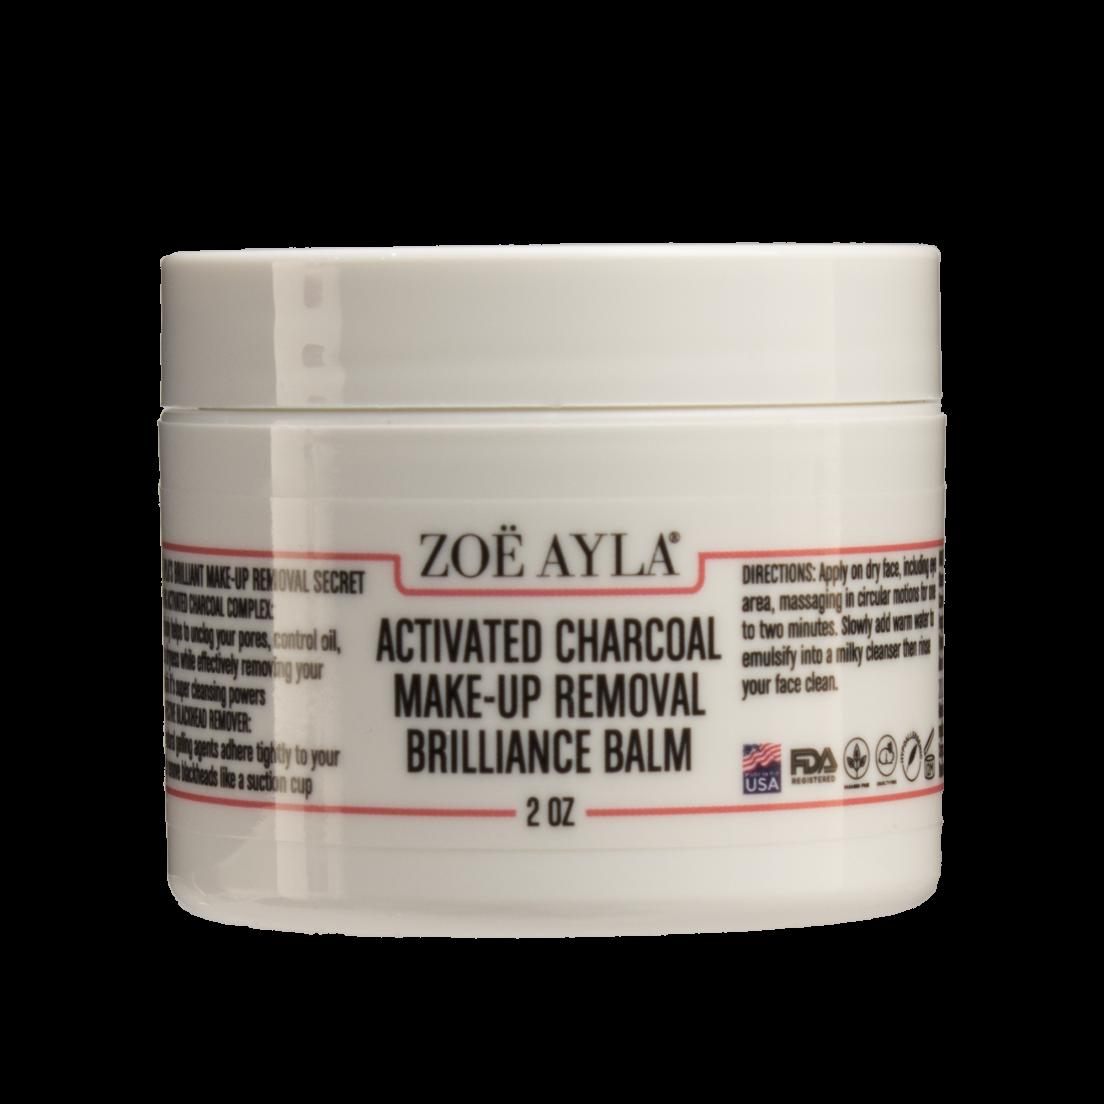 Logical Professional 7 Crystal Makeup Brushes Sets Transparent Screw Handle Make Up Tools Powder Eyeshadow Eyeliner Foundation Brush Kit Cheap Sales 50% Makeup